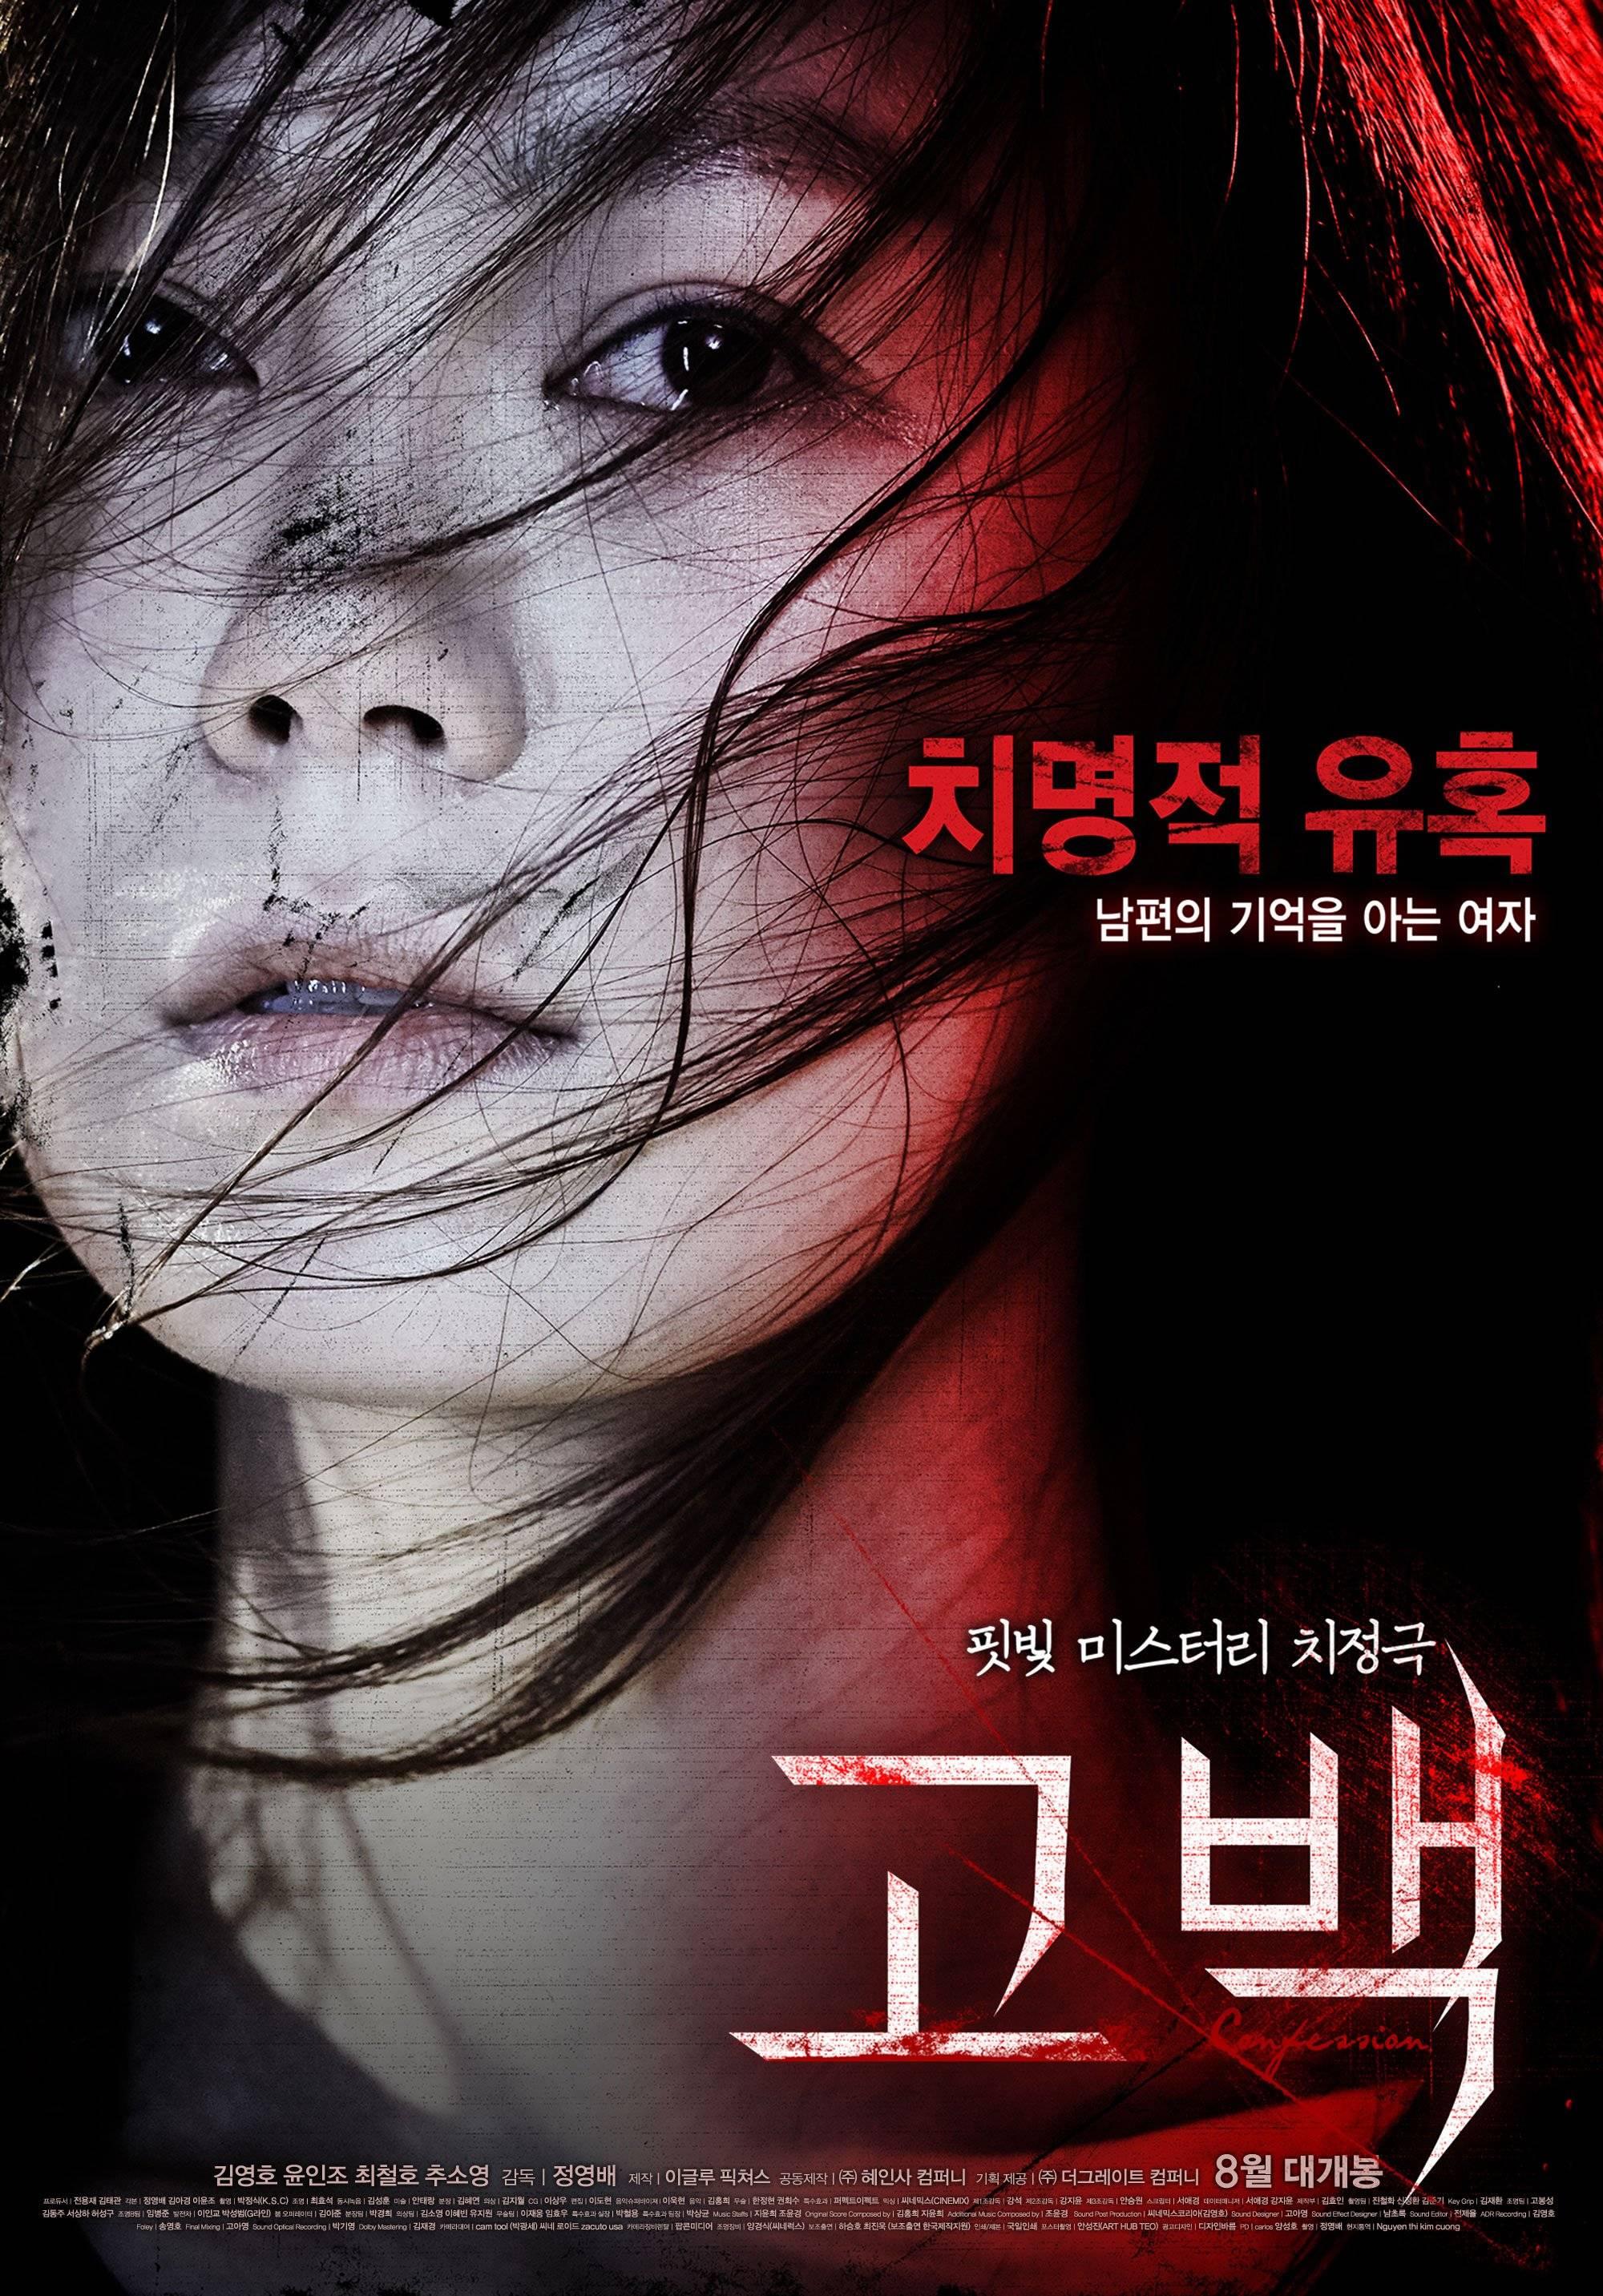 Confession - 2015 (고백) - Movie - Picture Gallery @ HanCinema :: The Korean Movie